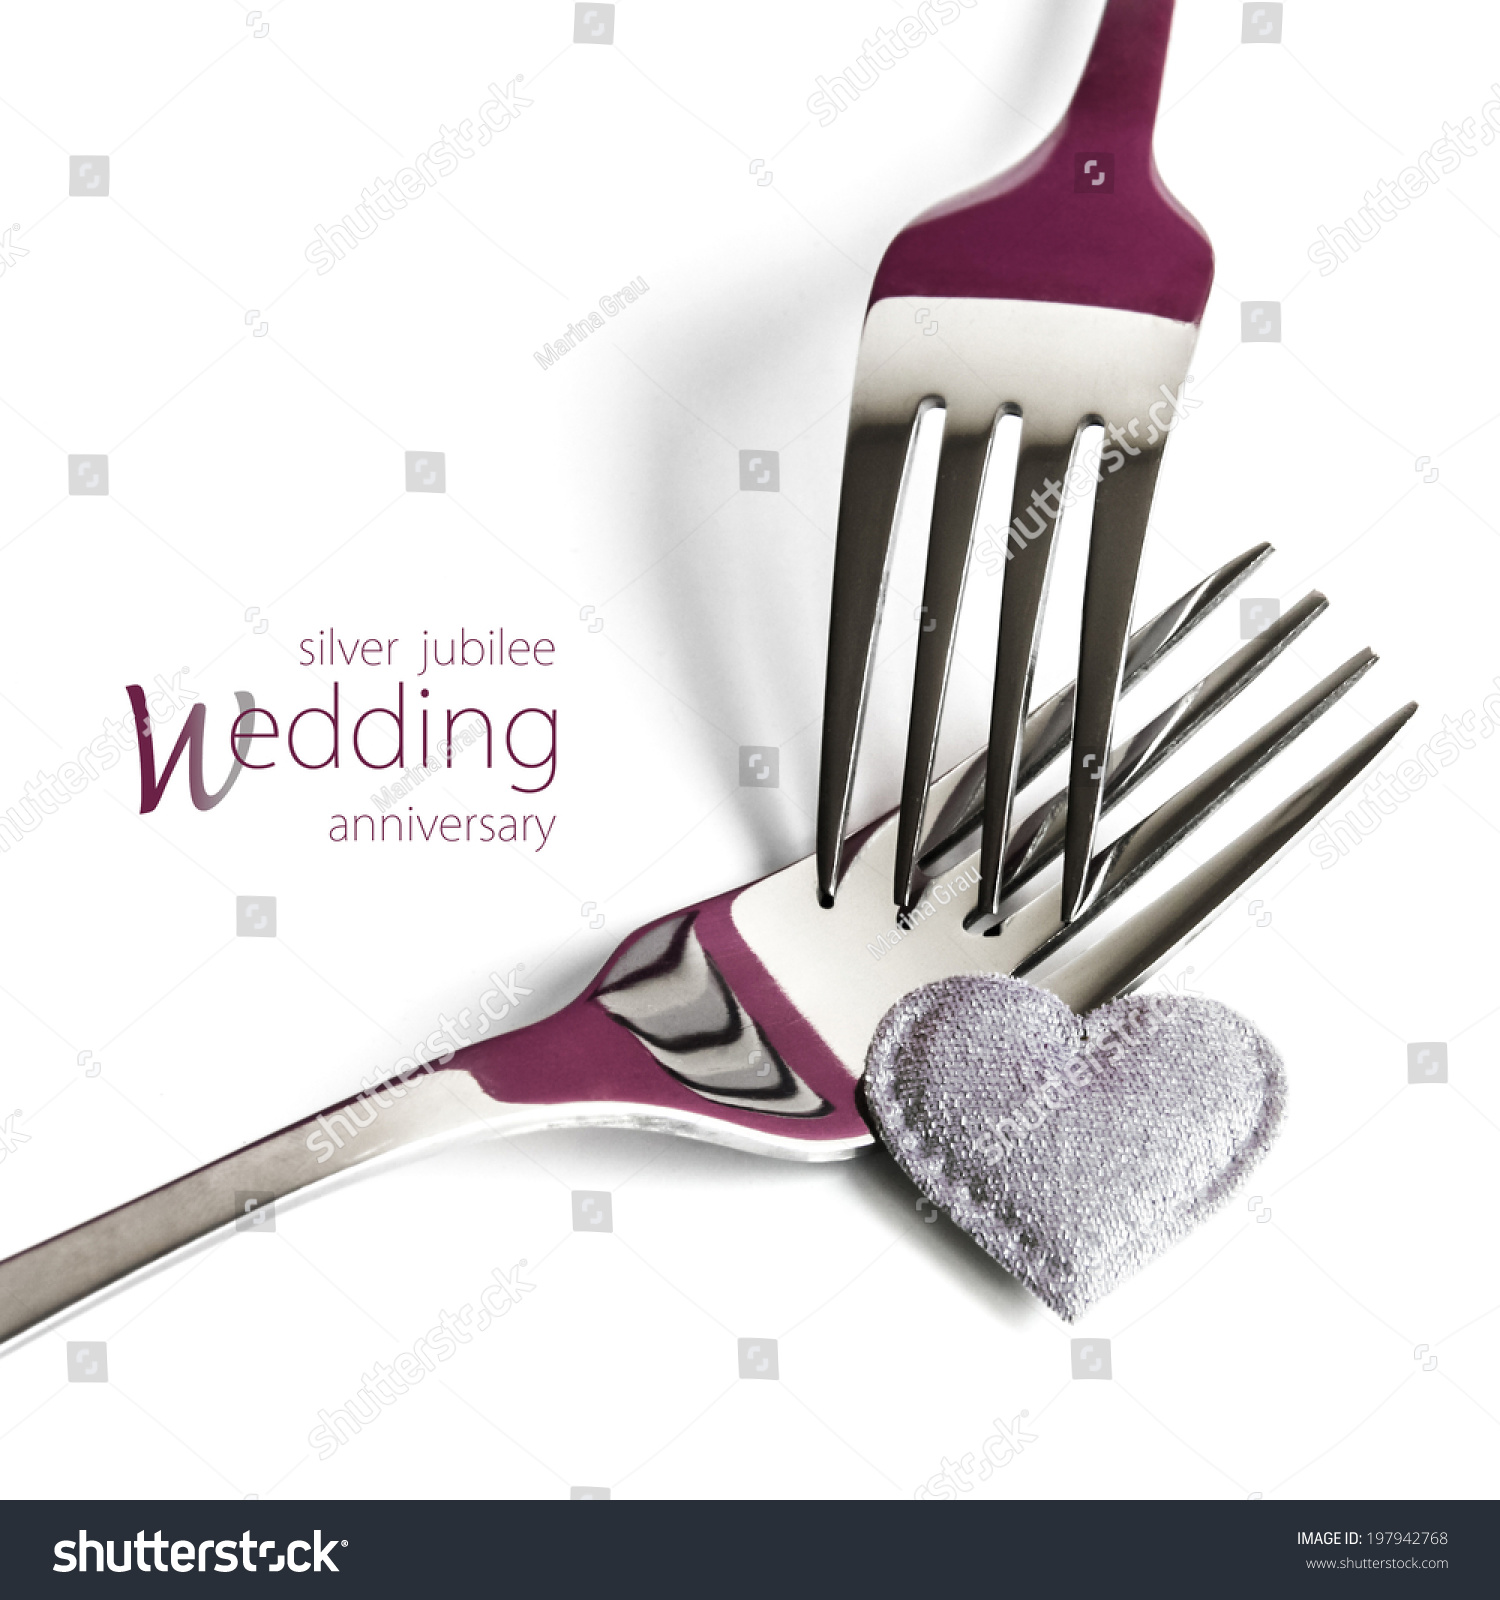 Silver Jubilee Wedding Anniversary Gifts: Conceptual Image Of Silver Jubilee Wedding Anniversary